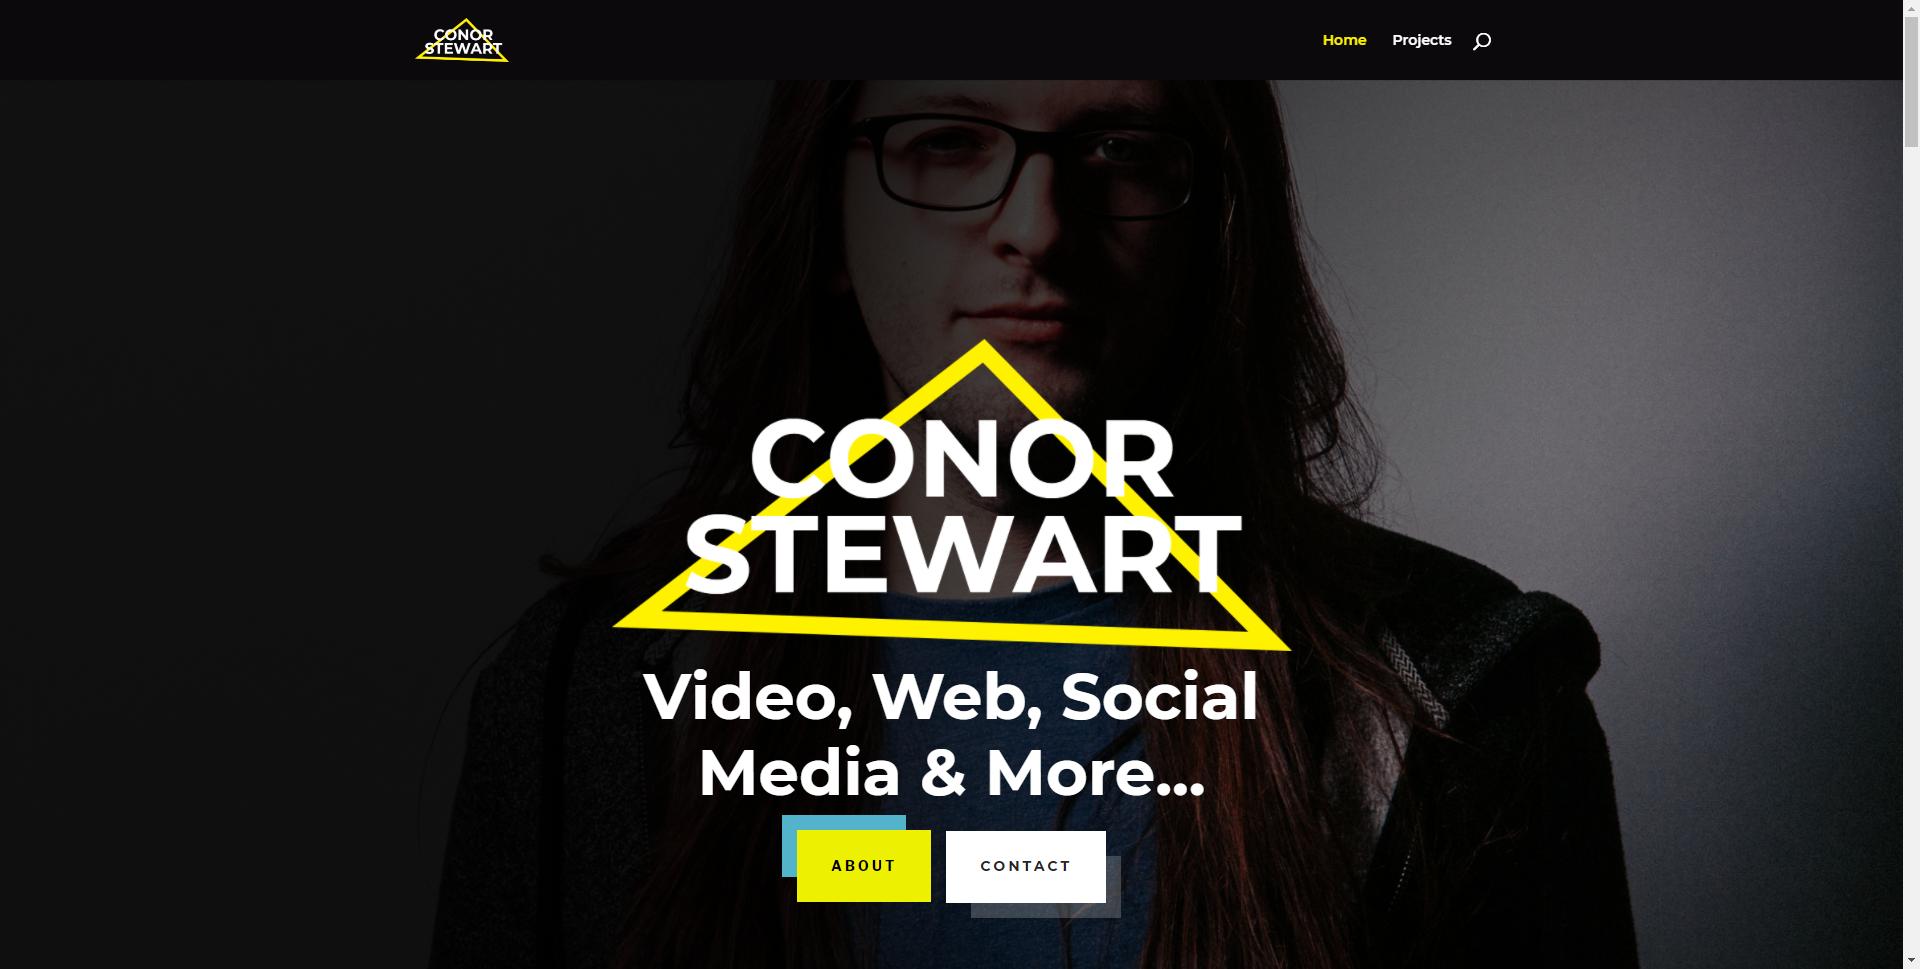 conorstewart.me Websites